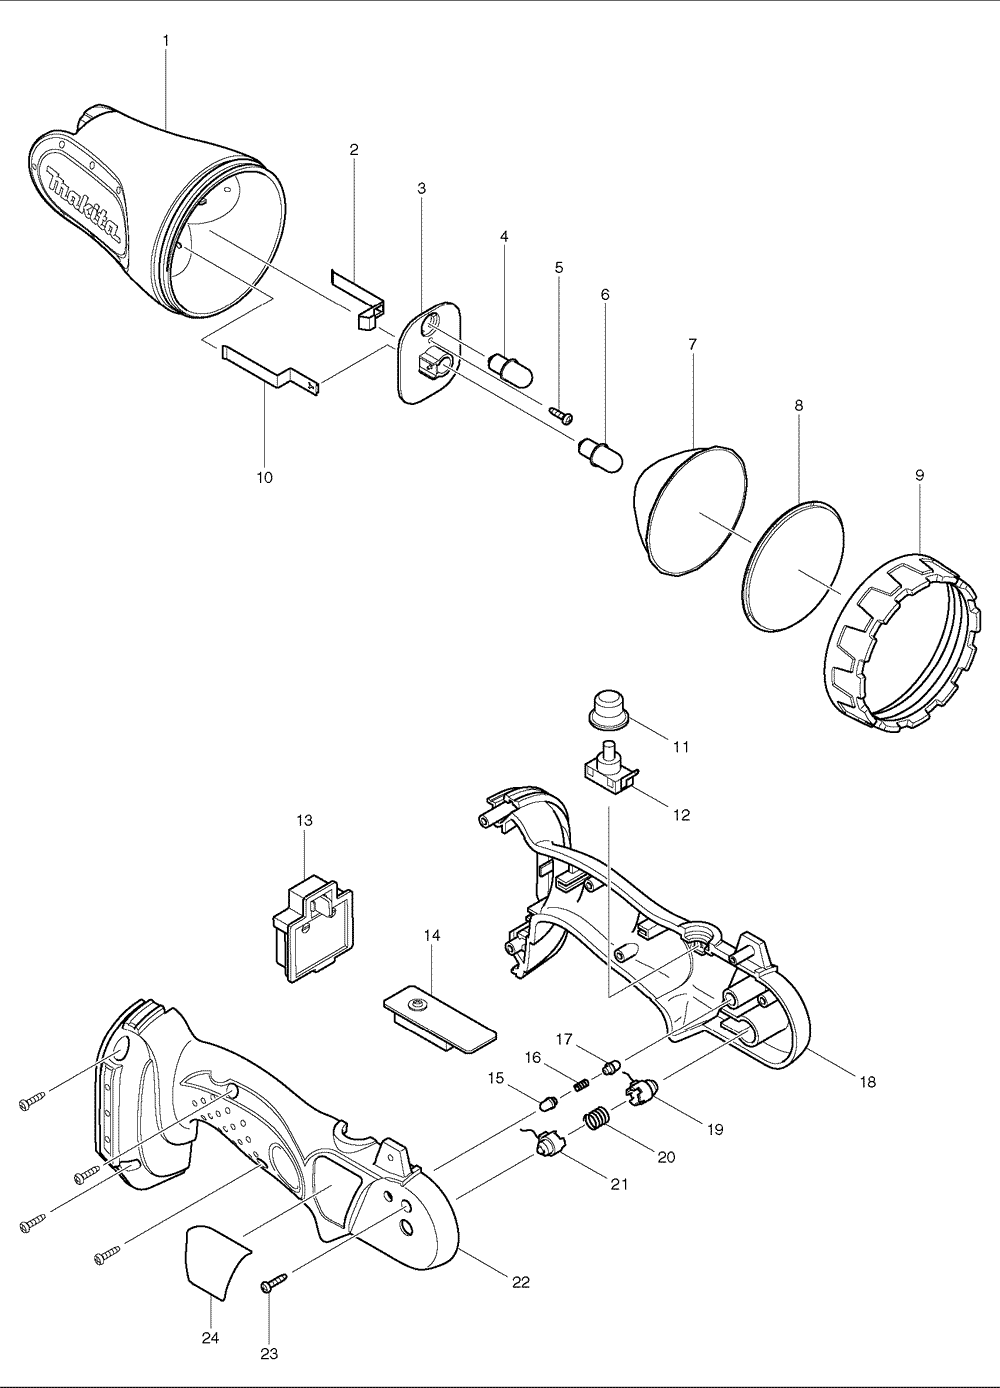 schematic diagram of flashlight